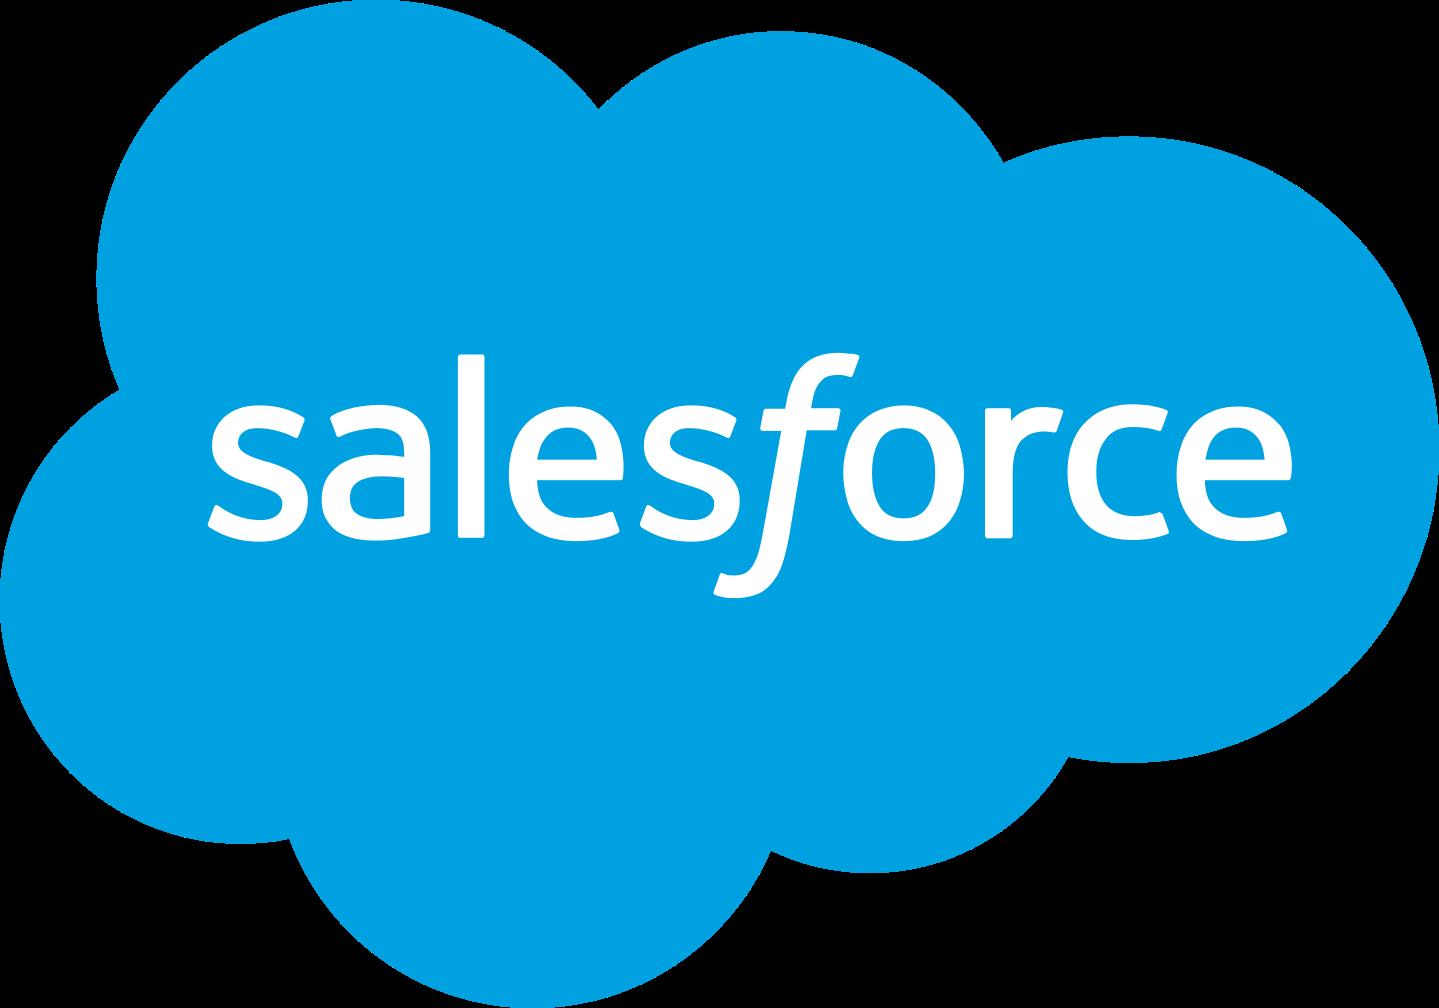 salesforce logo 2 - Salesforce Logo